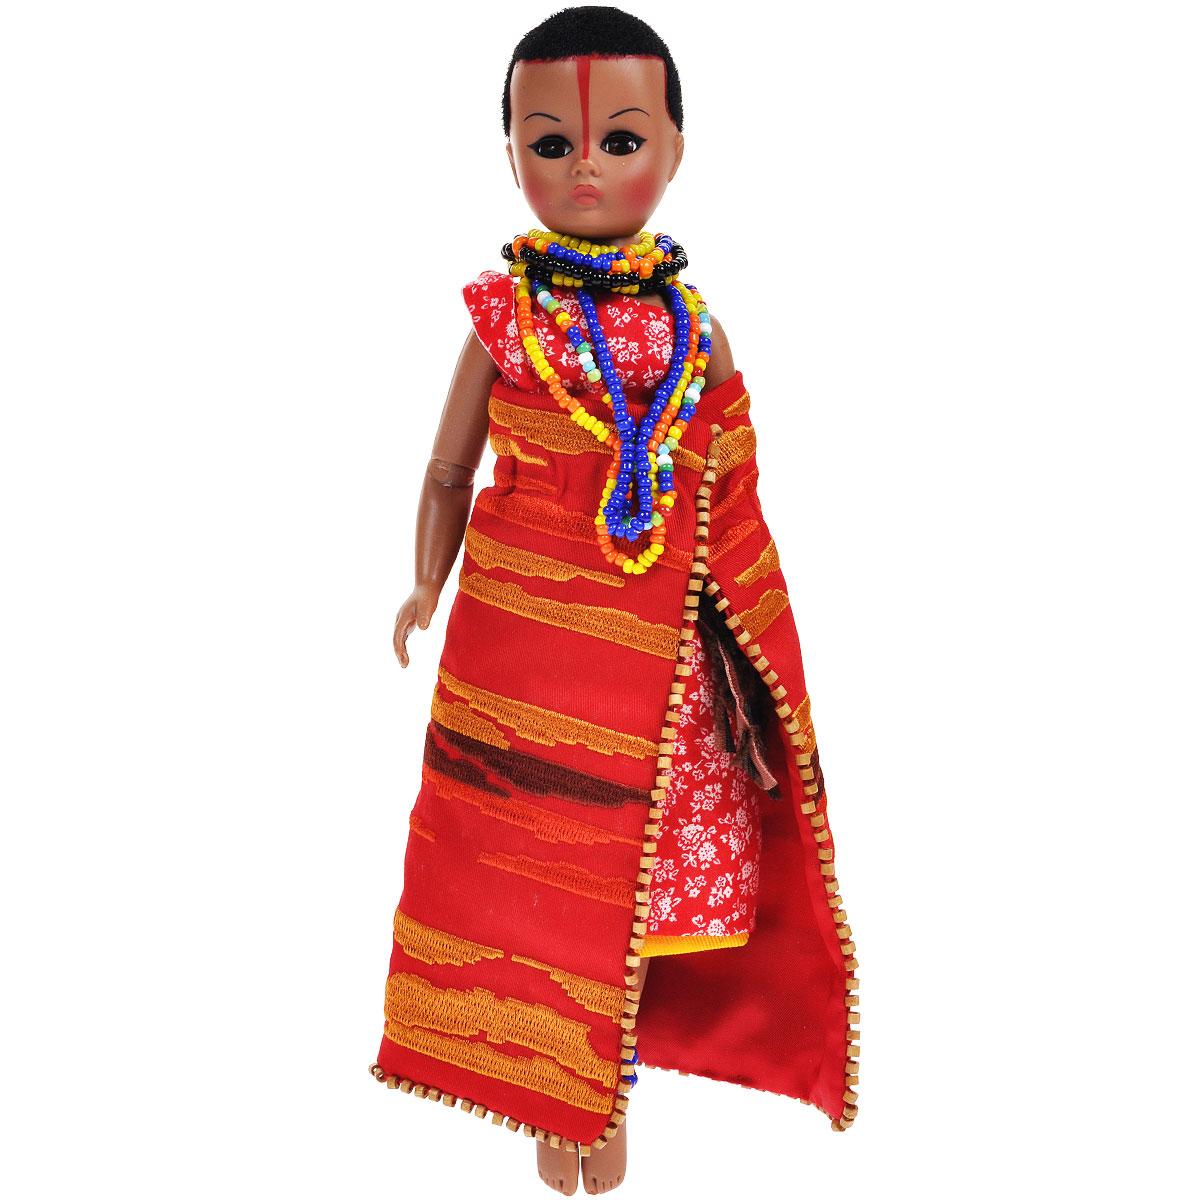 Madame Alexander Кукла Из племени Масаи куклы и одежда для кукол madame alexander кукла фэнси нэнси русалочка 20 см